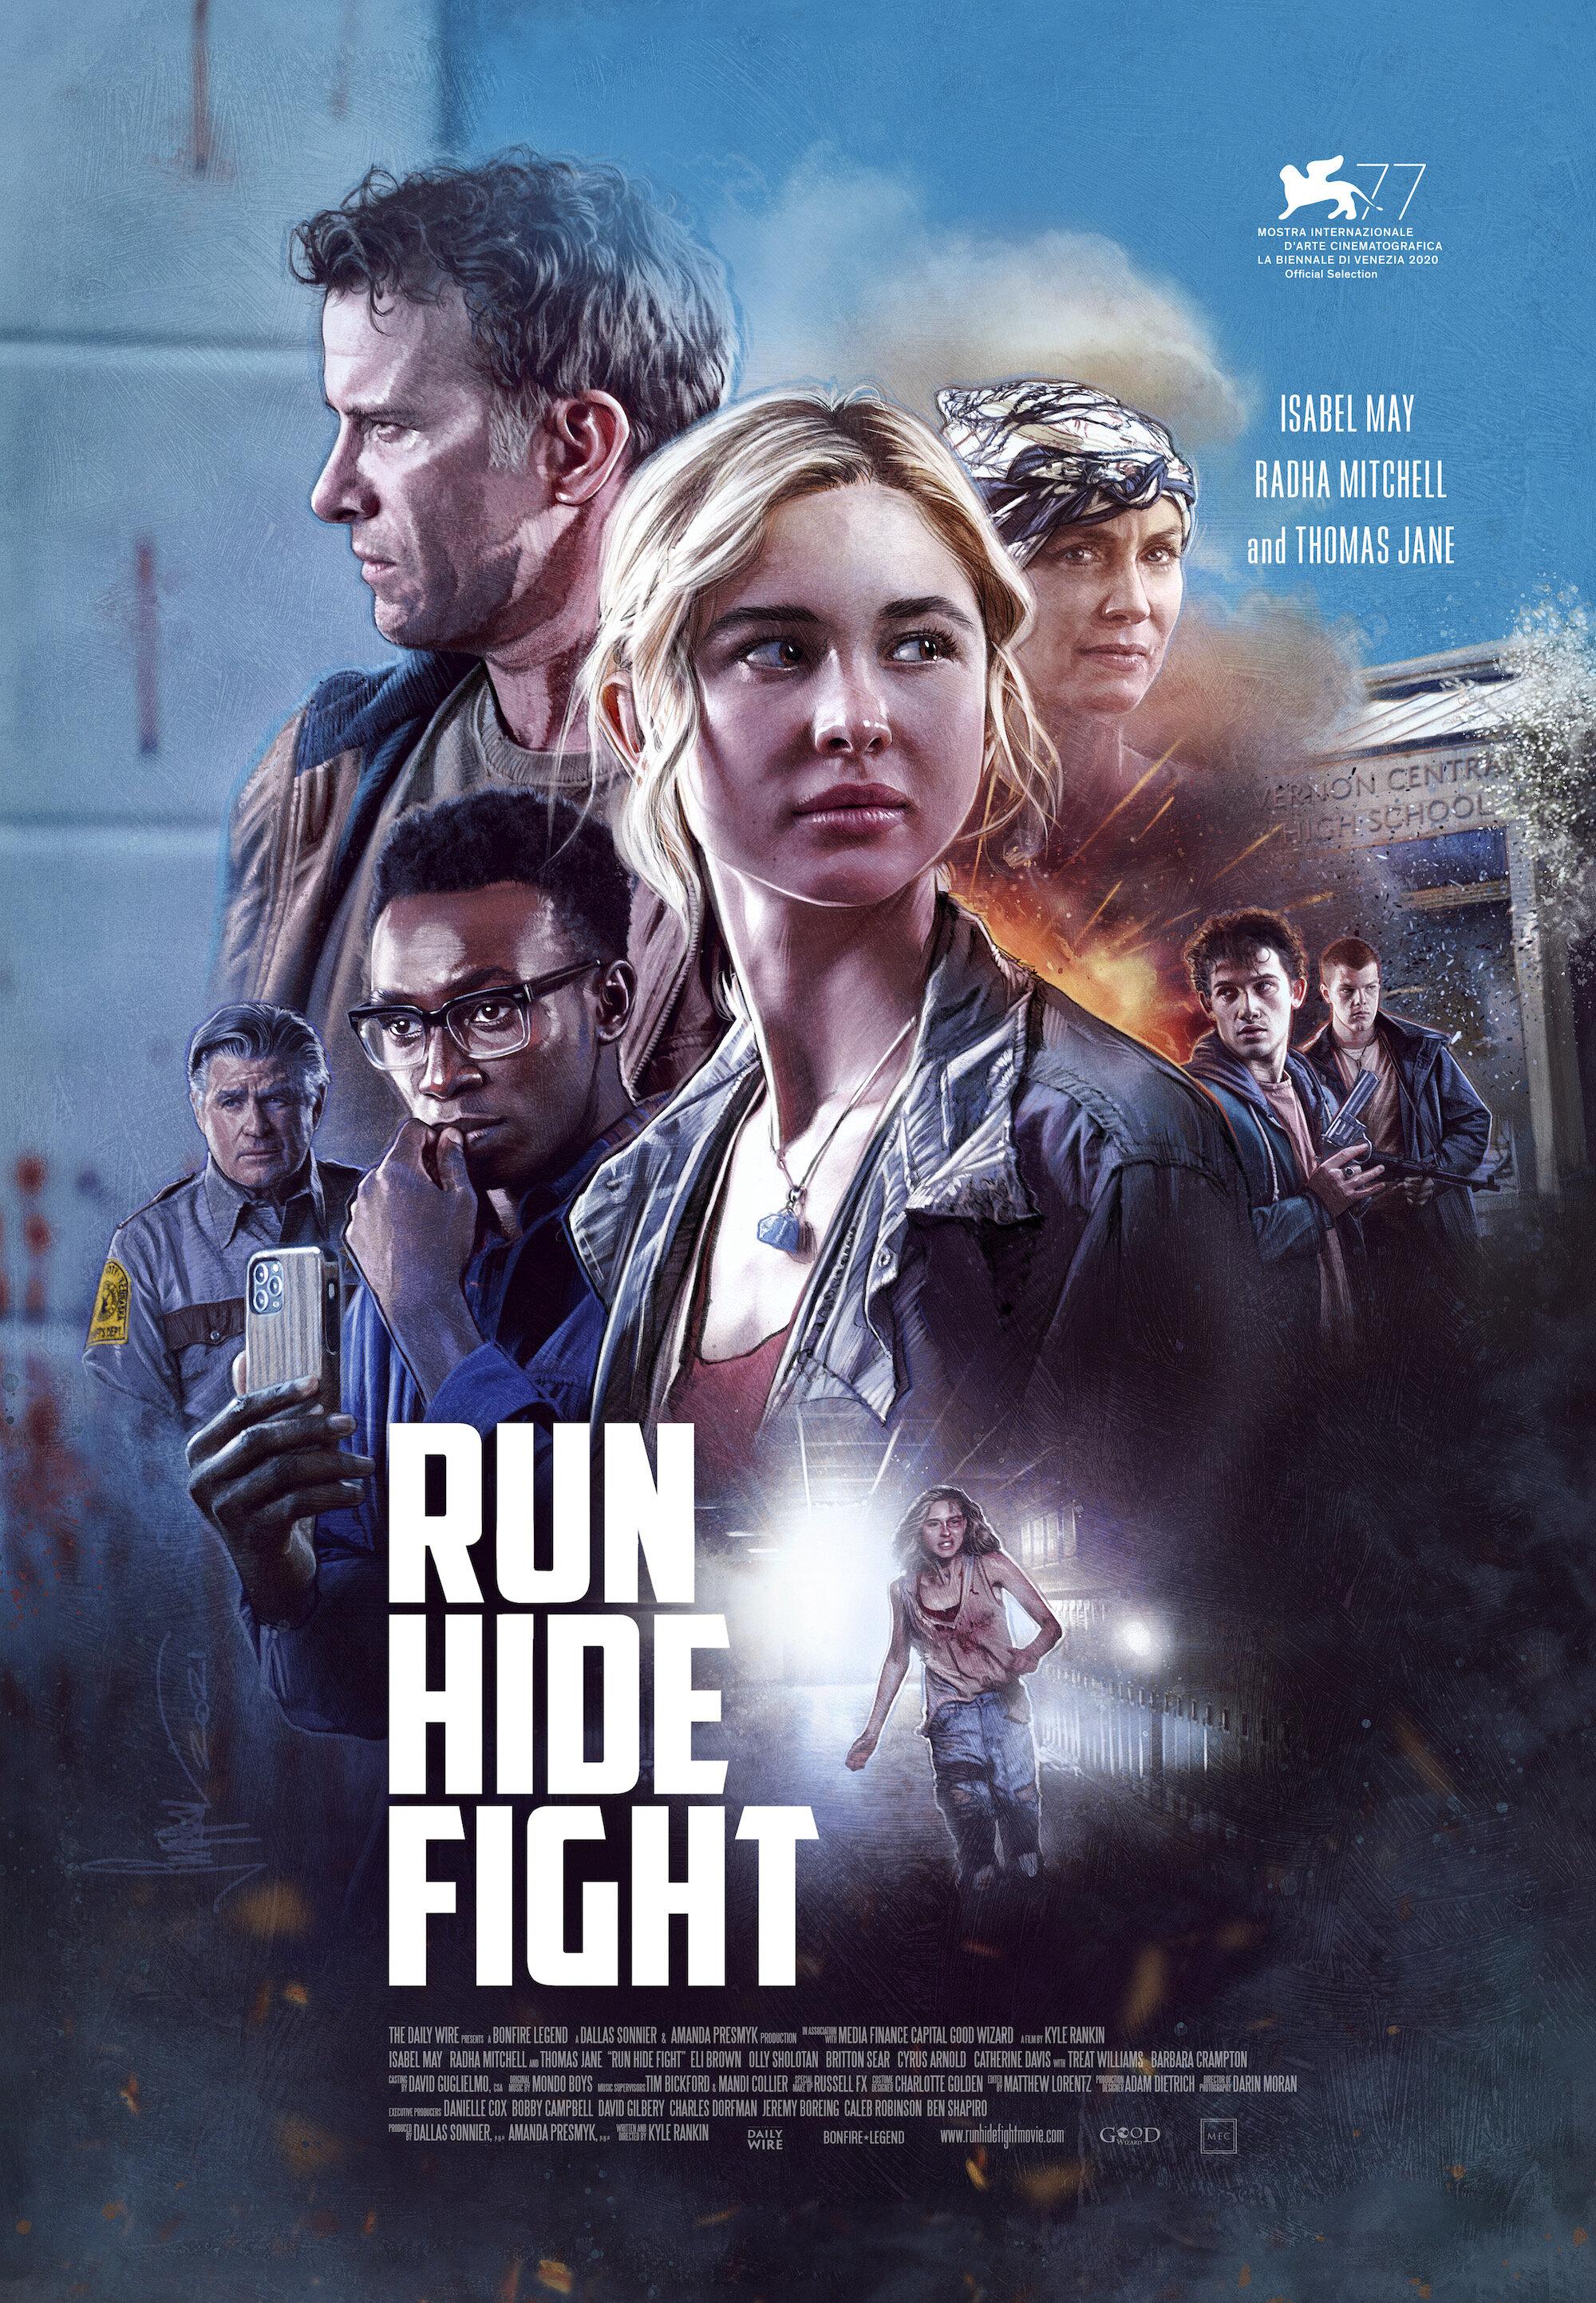 FOX ACTION MOVIES: RUN HIDE FIGHT